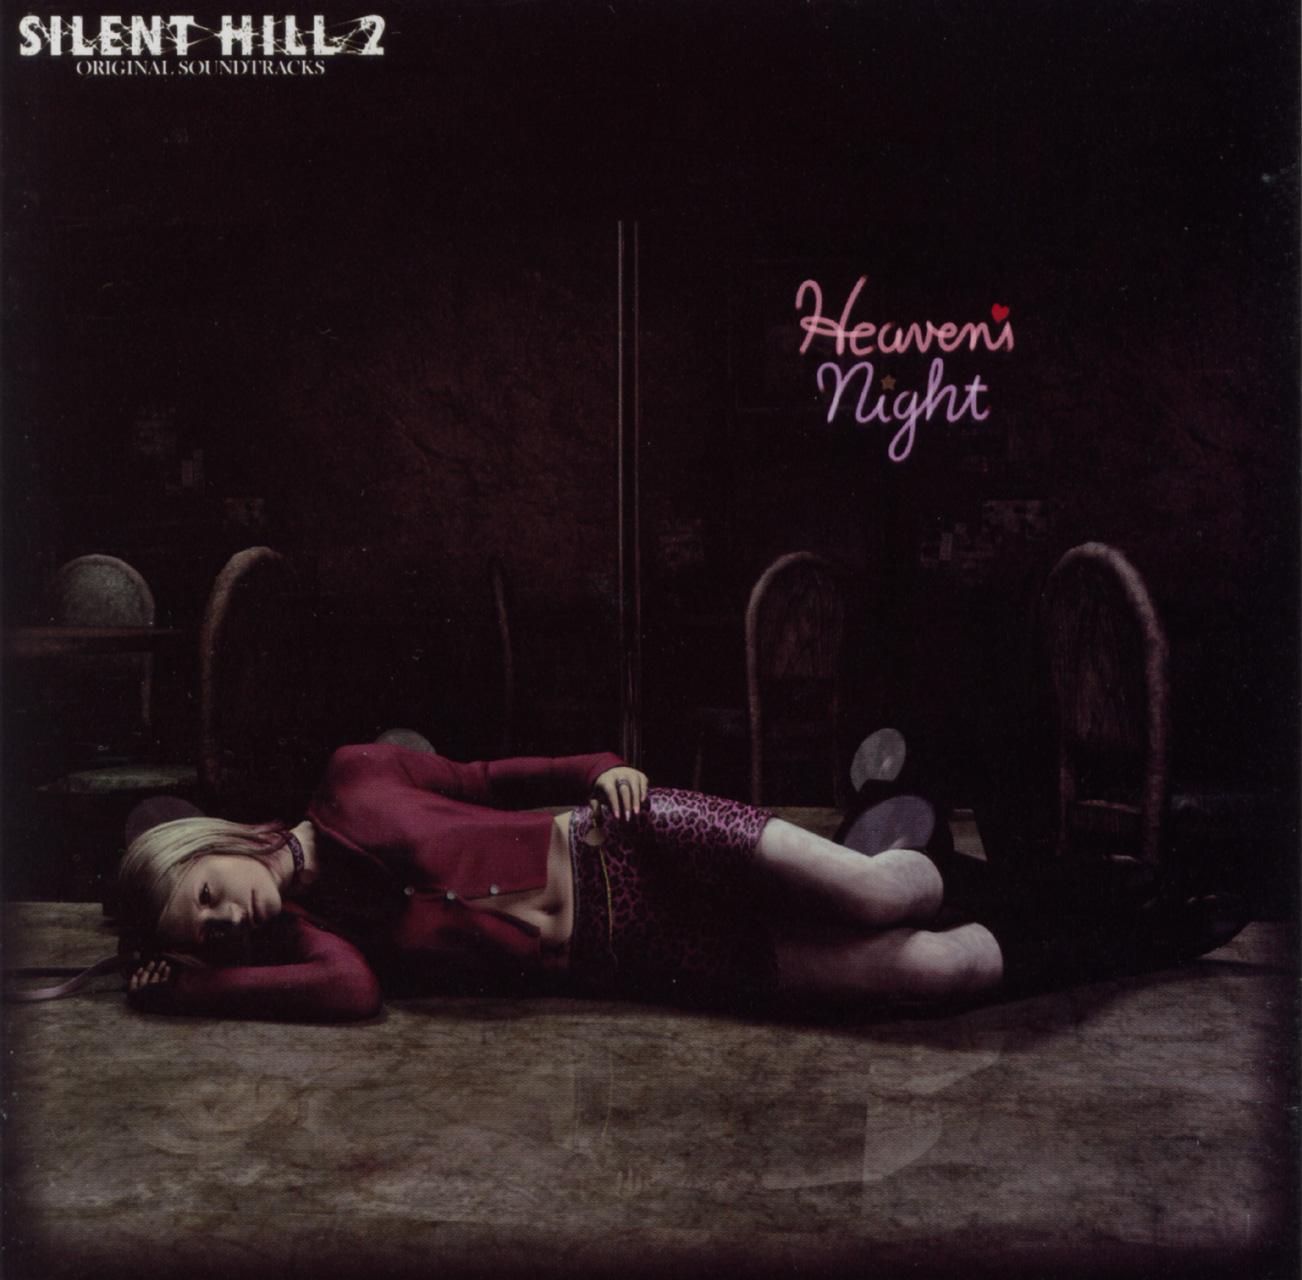 Silent hill 2 ost black fairy - 5 2